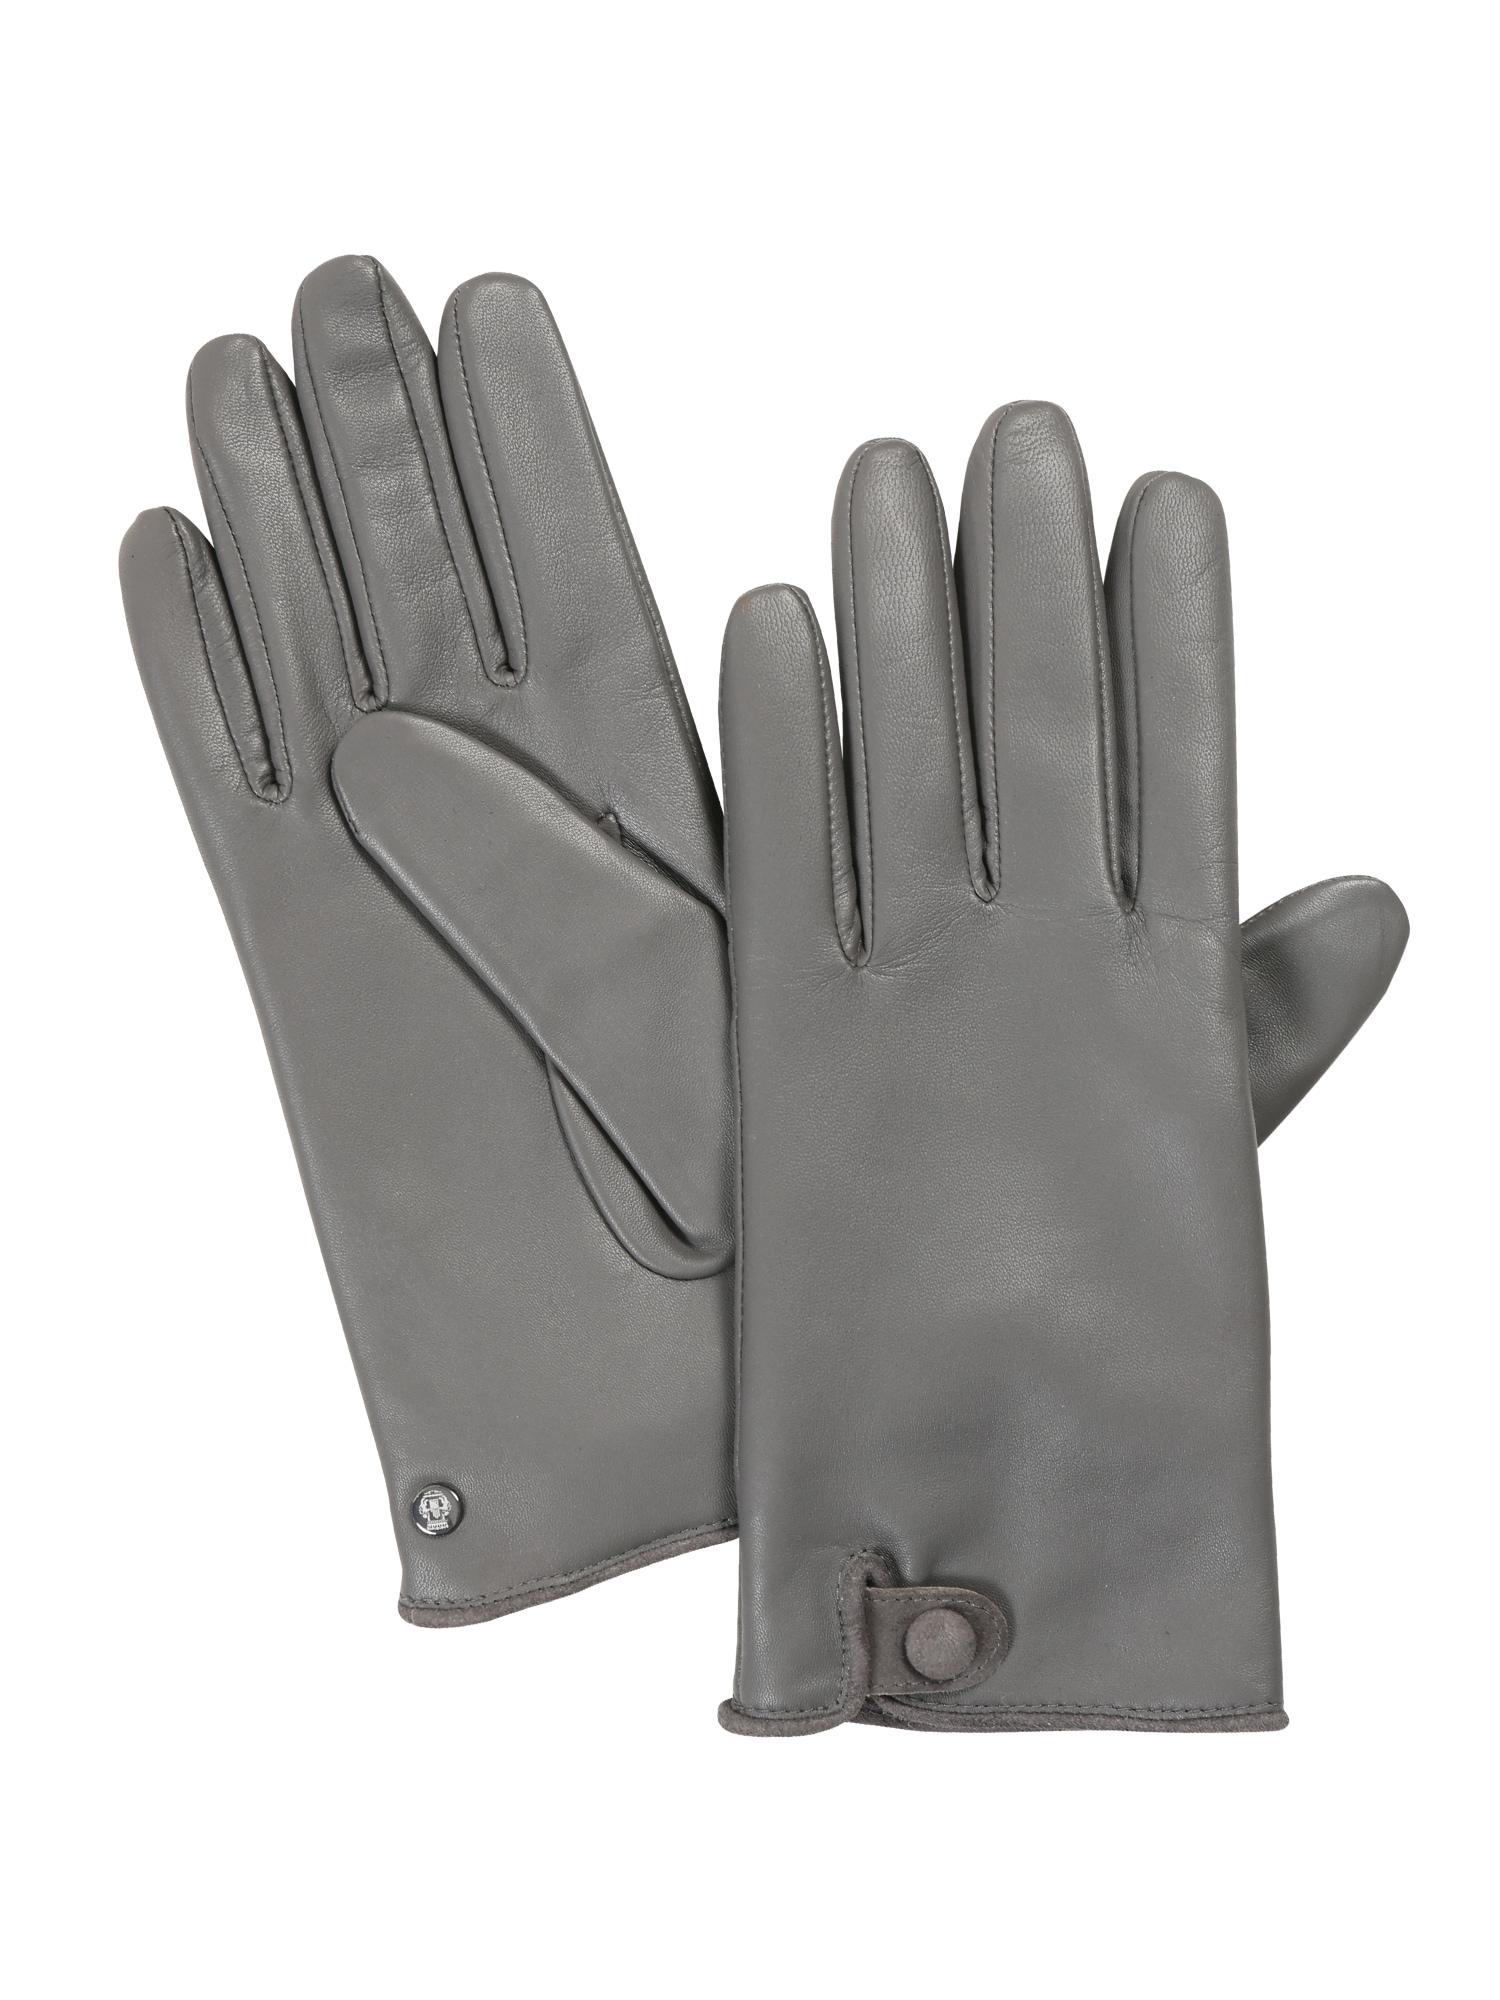 Lederhandschuhe 'Tiny Belt' | Accessoires > Handschuhe > Lederhandschuhe | Roeckl